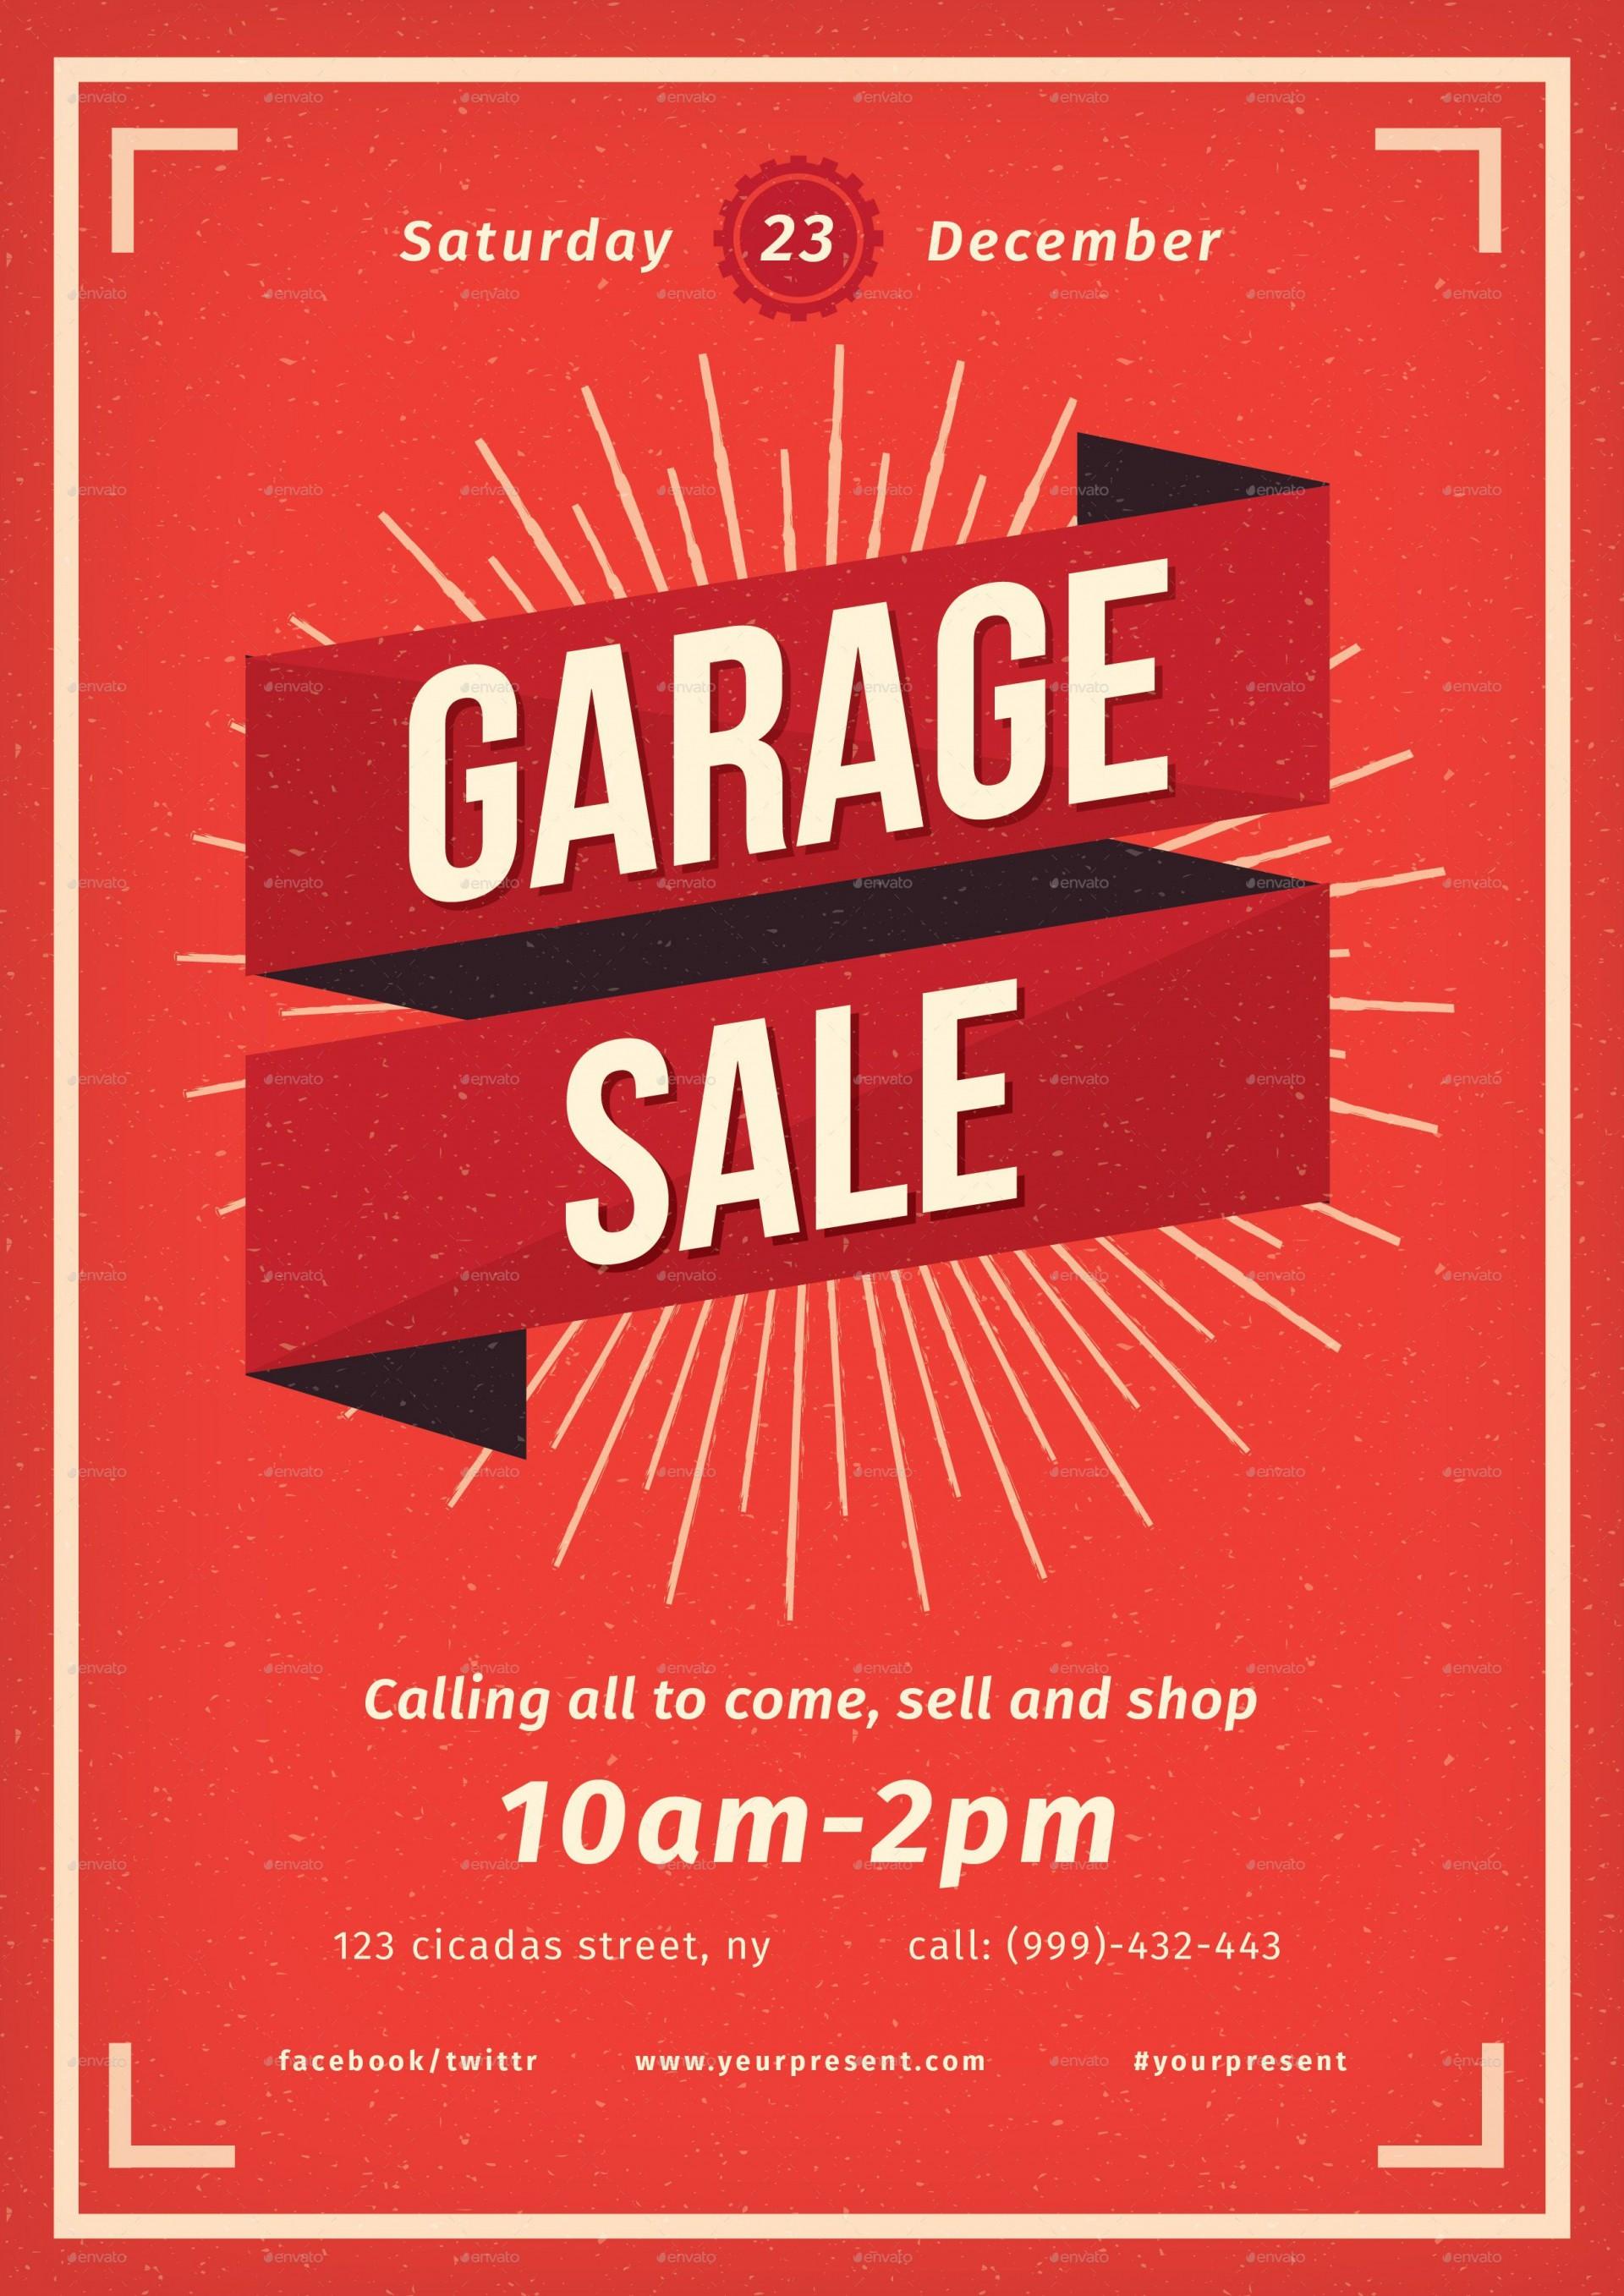 000 Simple Garage Sale Flyer Template Free High Def  Community Neighborhood Yard1920